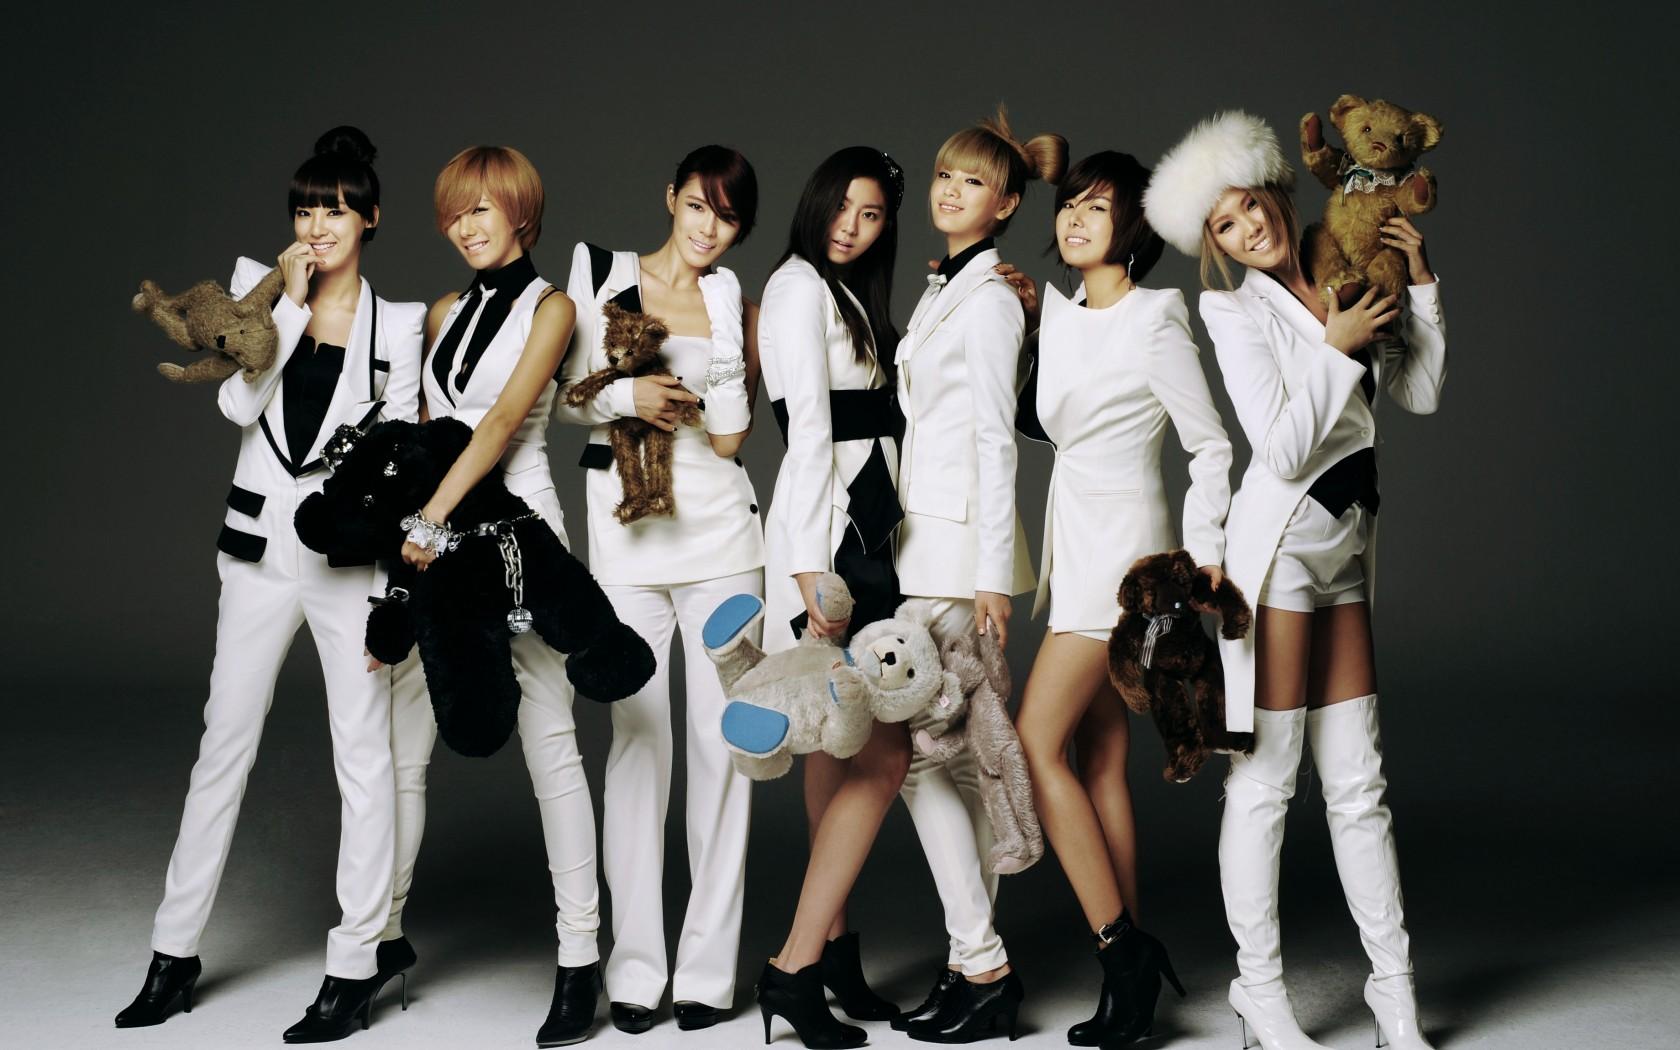 K pop   kpop 4ever Wallpaper 33571582 1680x1050